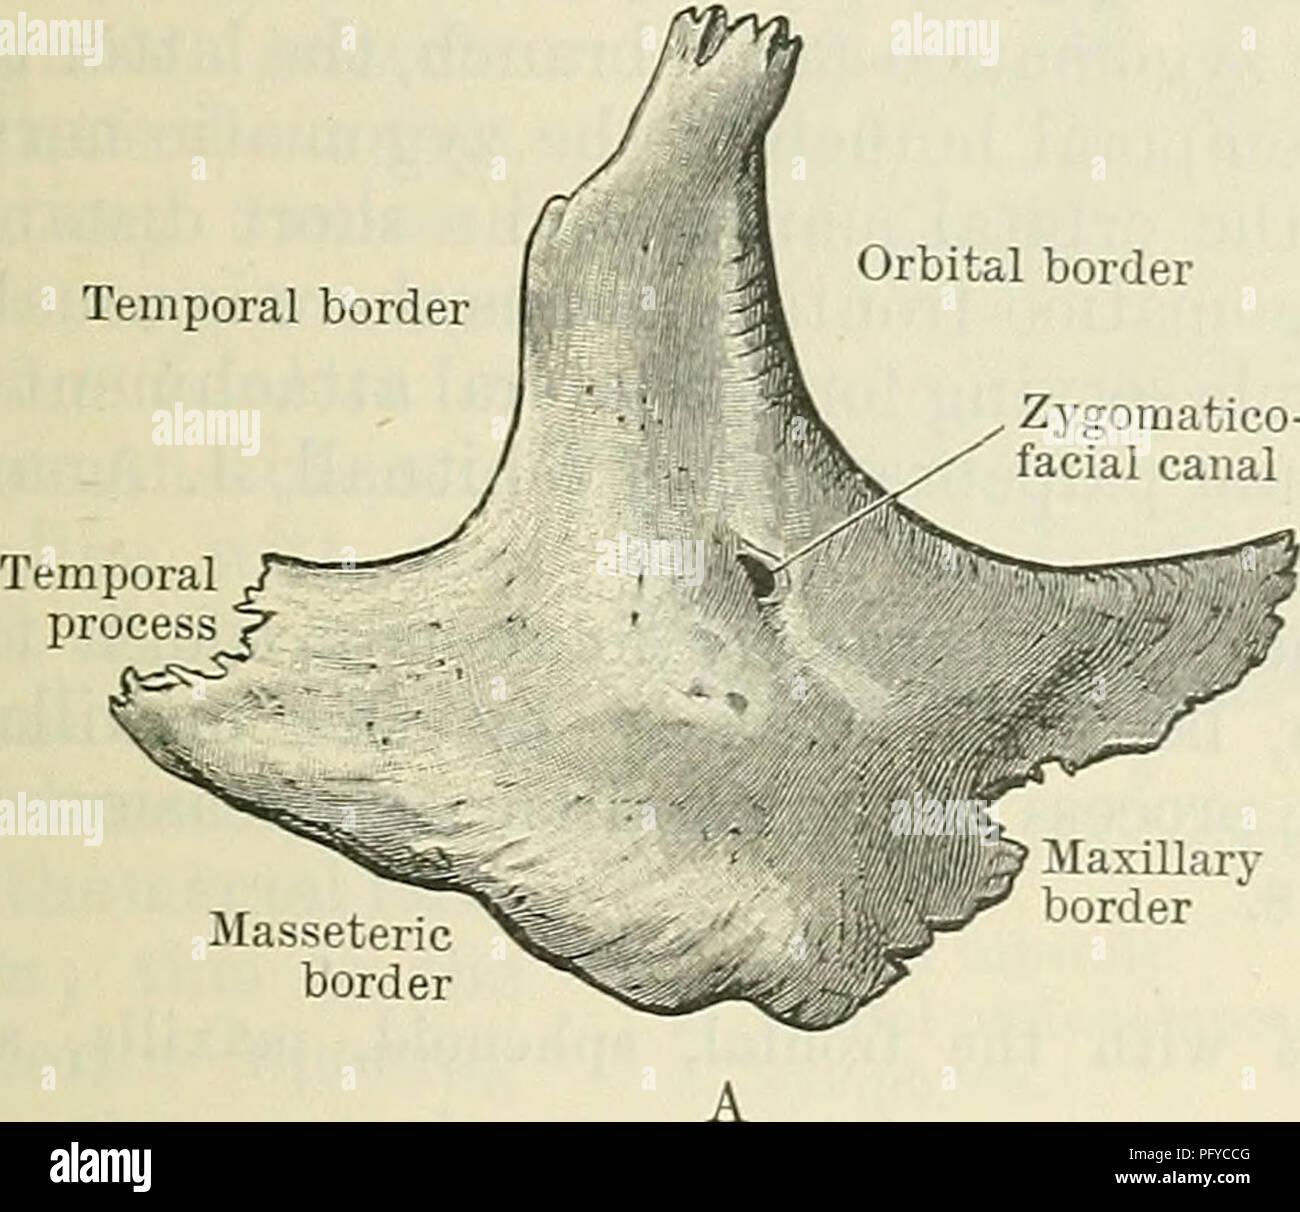 Cunninghams Text Book Of Anatomy Anatomy The Zygomatic Bones 153